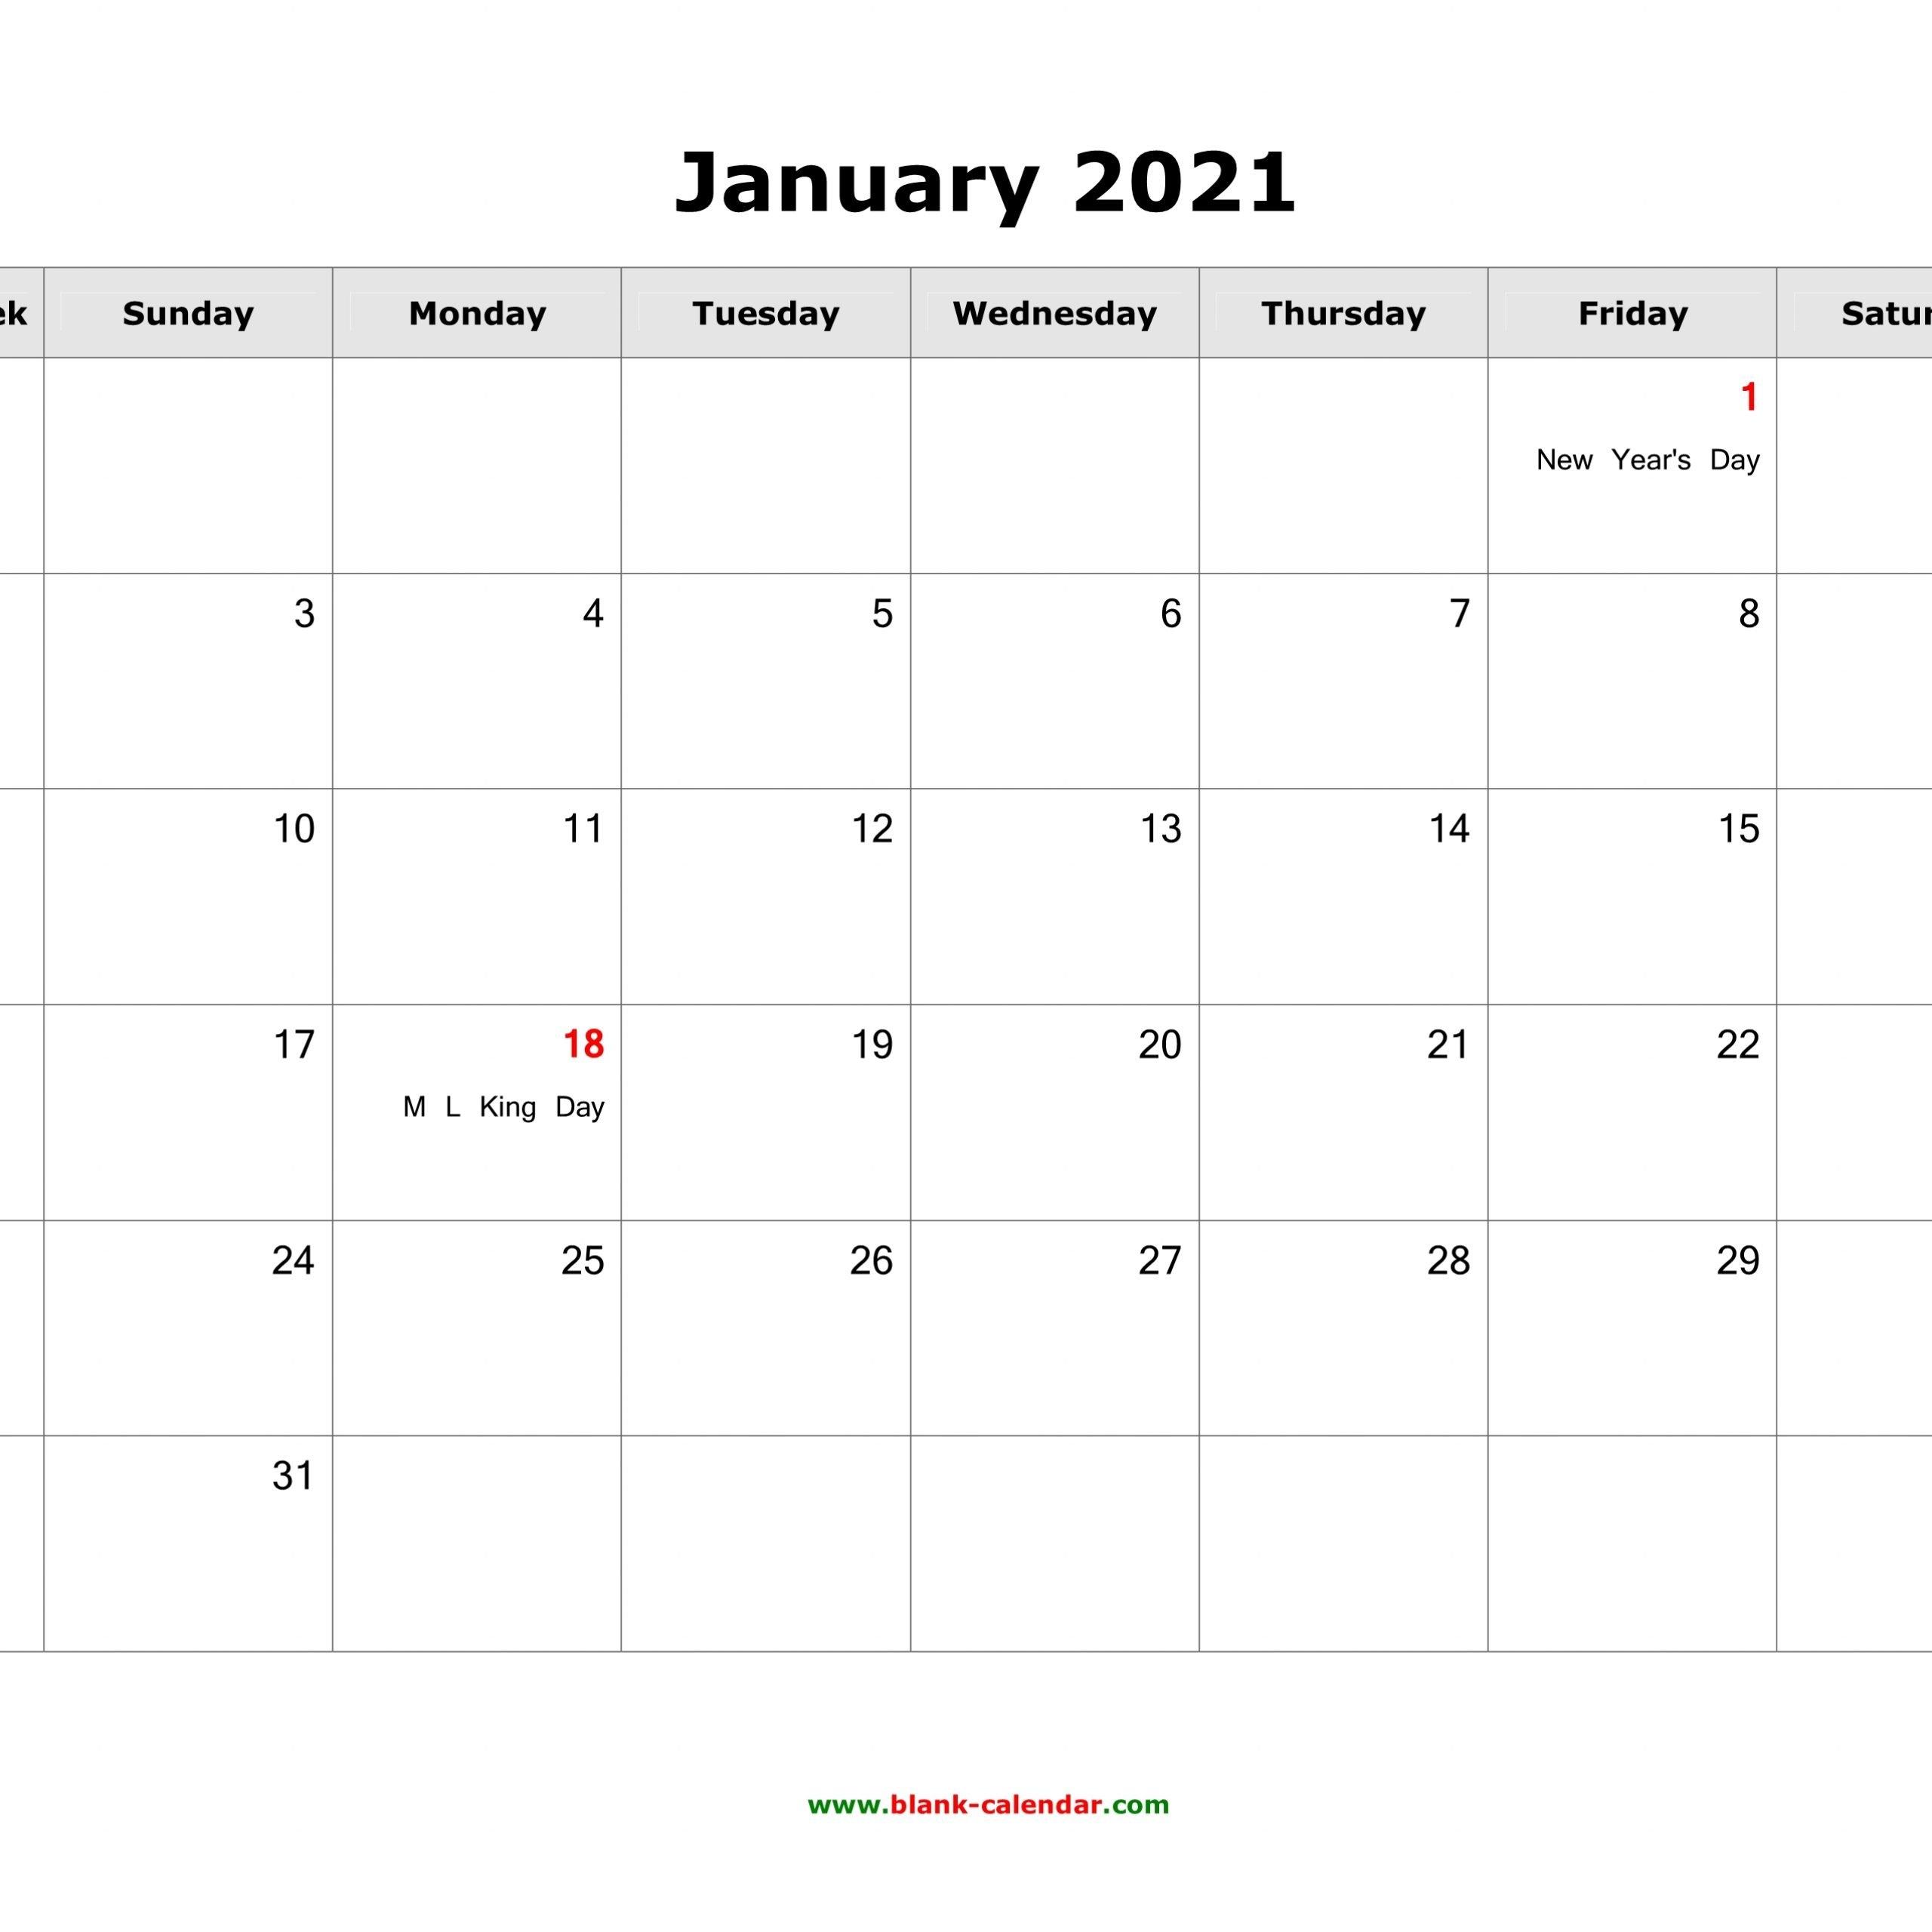 Jan 2021 Calendar Template Word   Free Printable Calendar throughout 2021 Julian Calendar Pdf Image